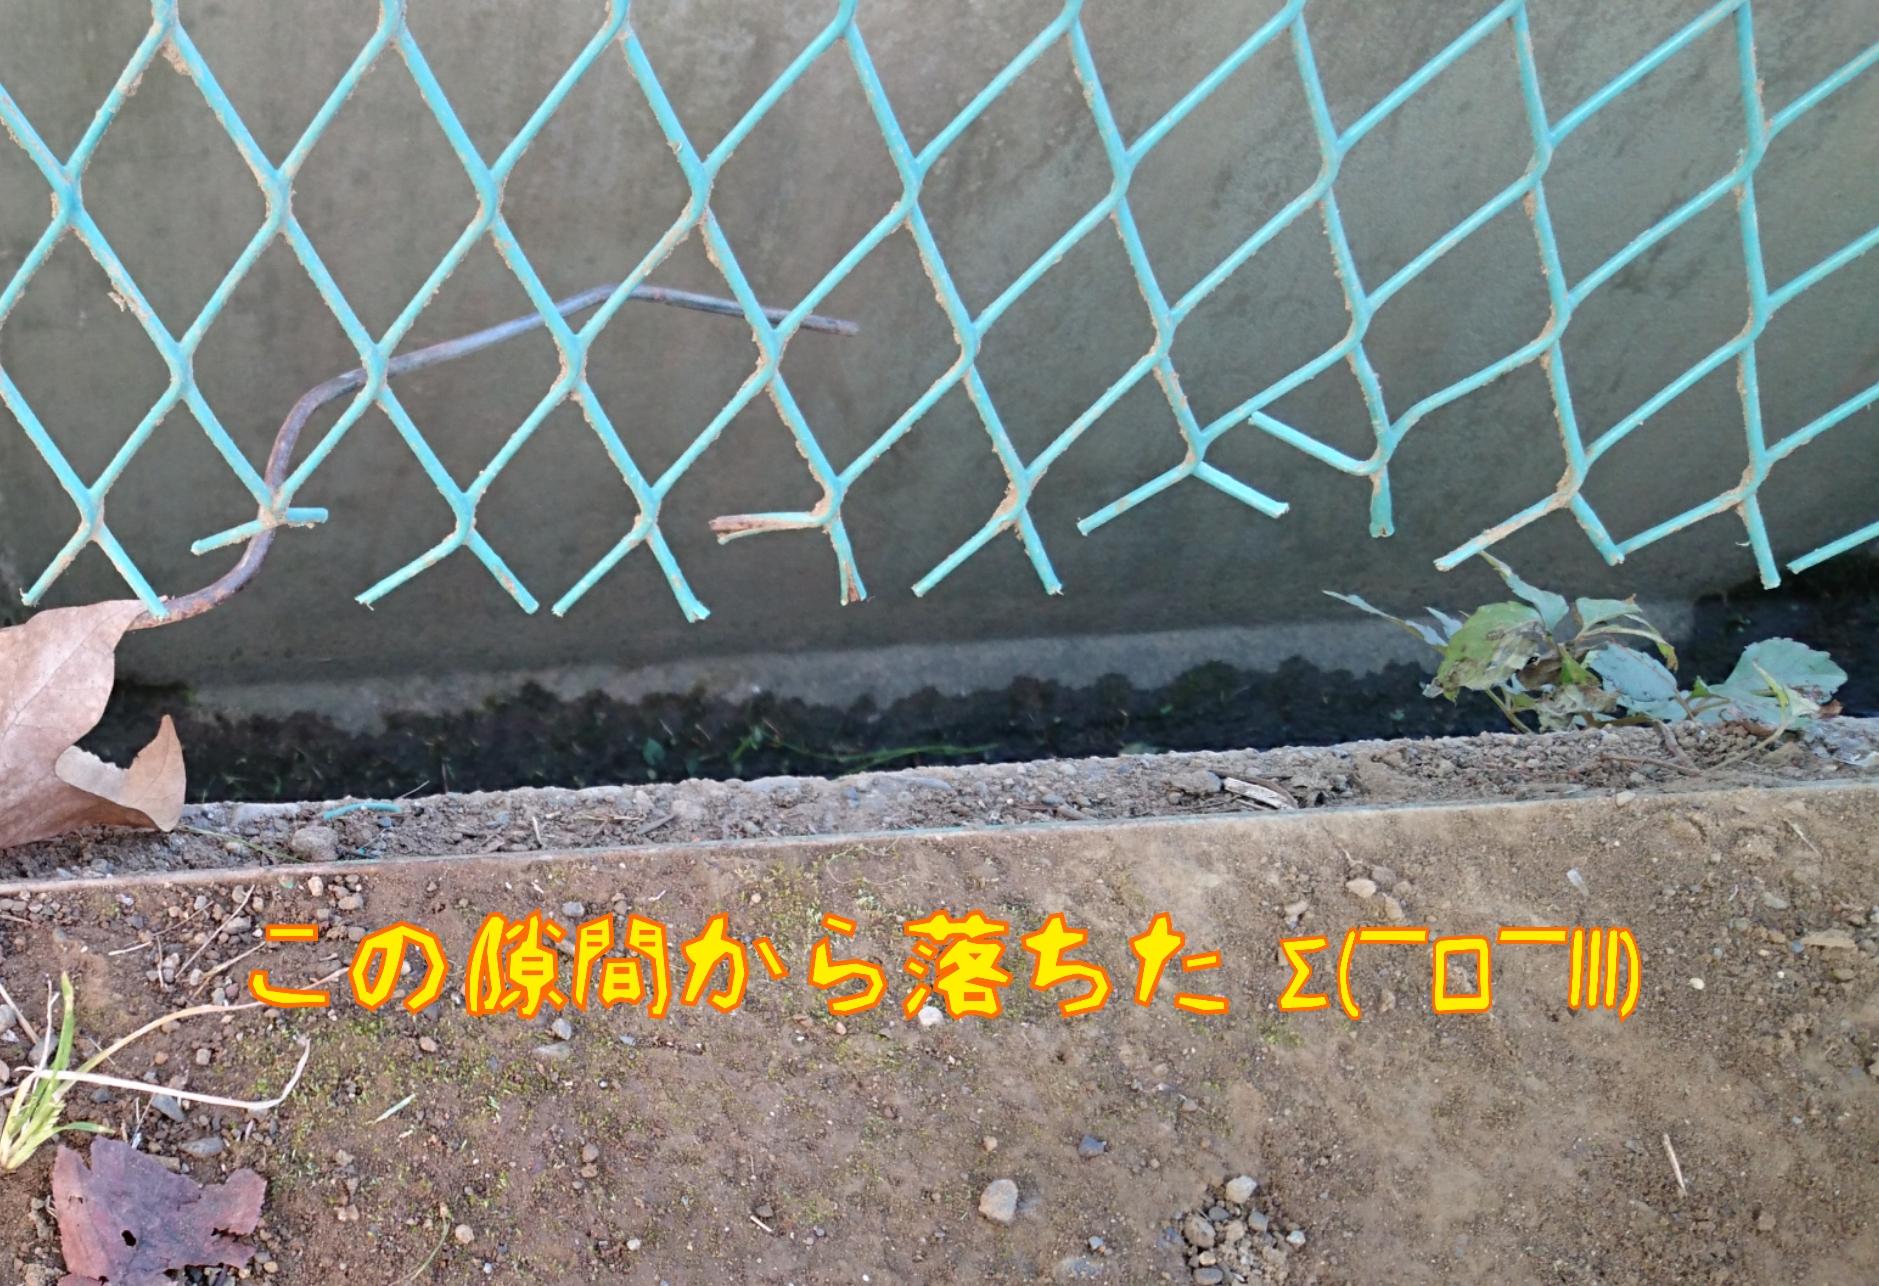 20151025145947a56.jpg